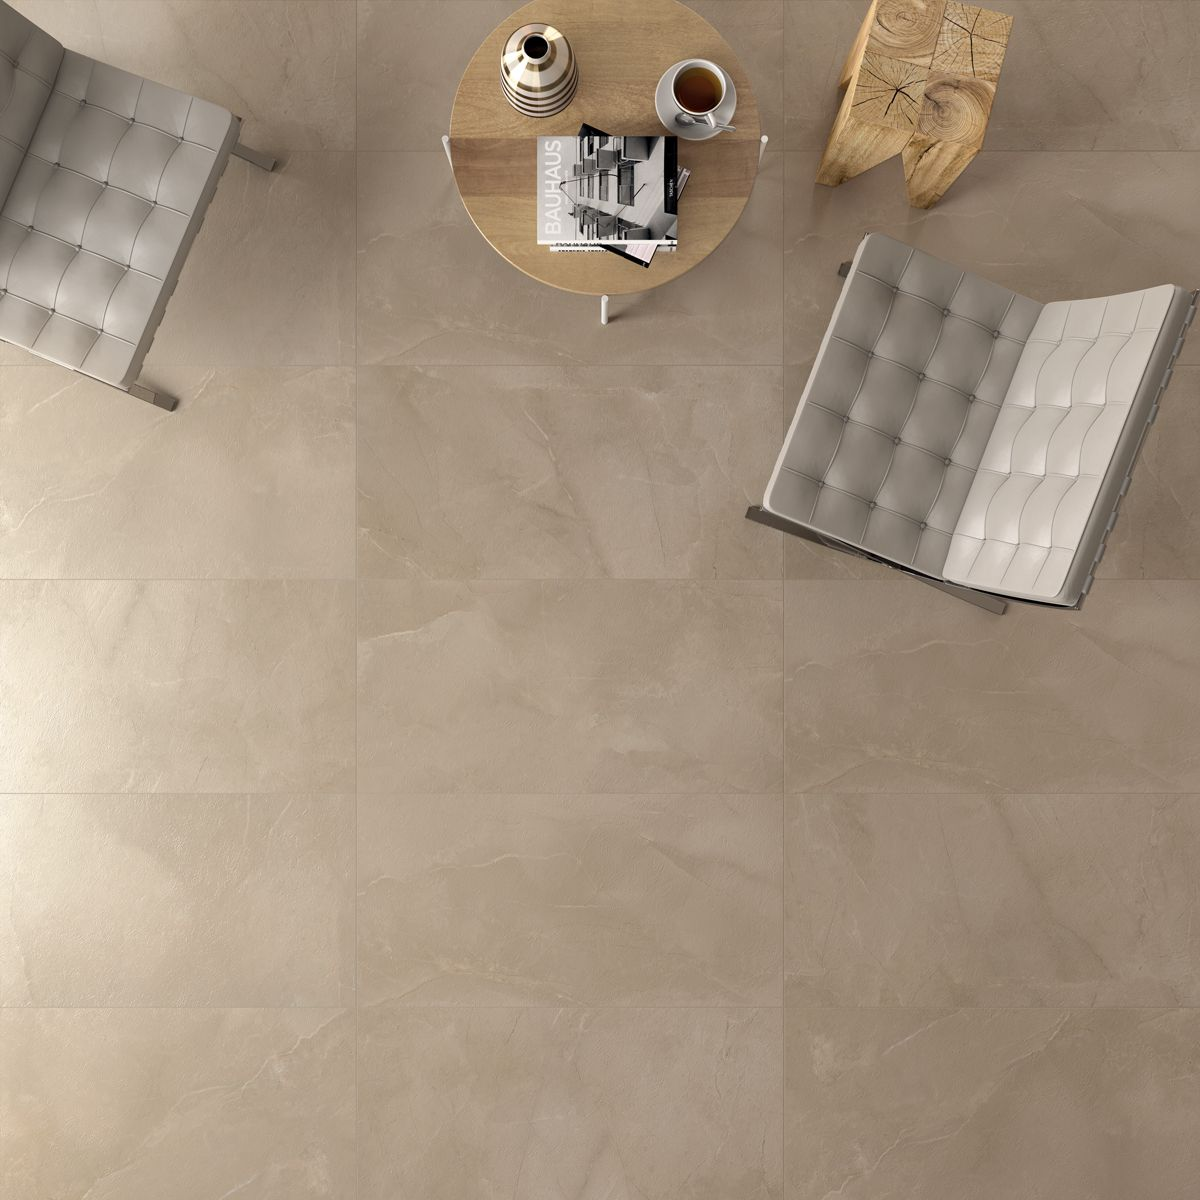 Pavimento sensi abkemozioni sahara cream sabl 60x120 cm pavimento sensi abkemozioni sahara cream sabl 60x120 cm ceramic tiles floor dailygadgetfo Images